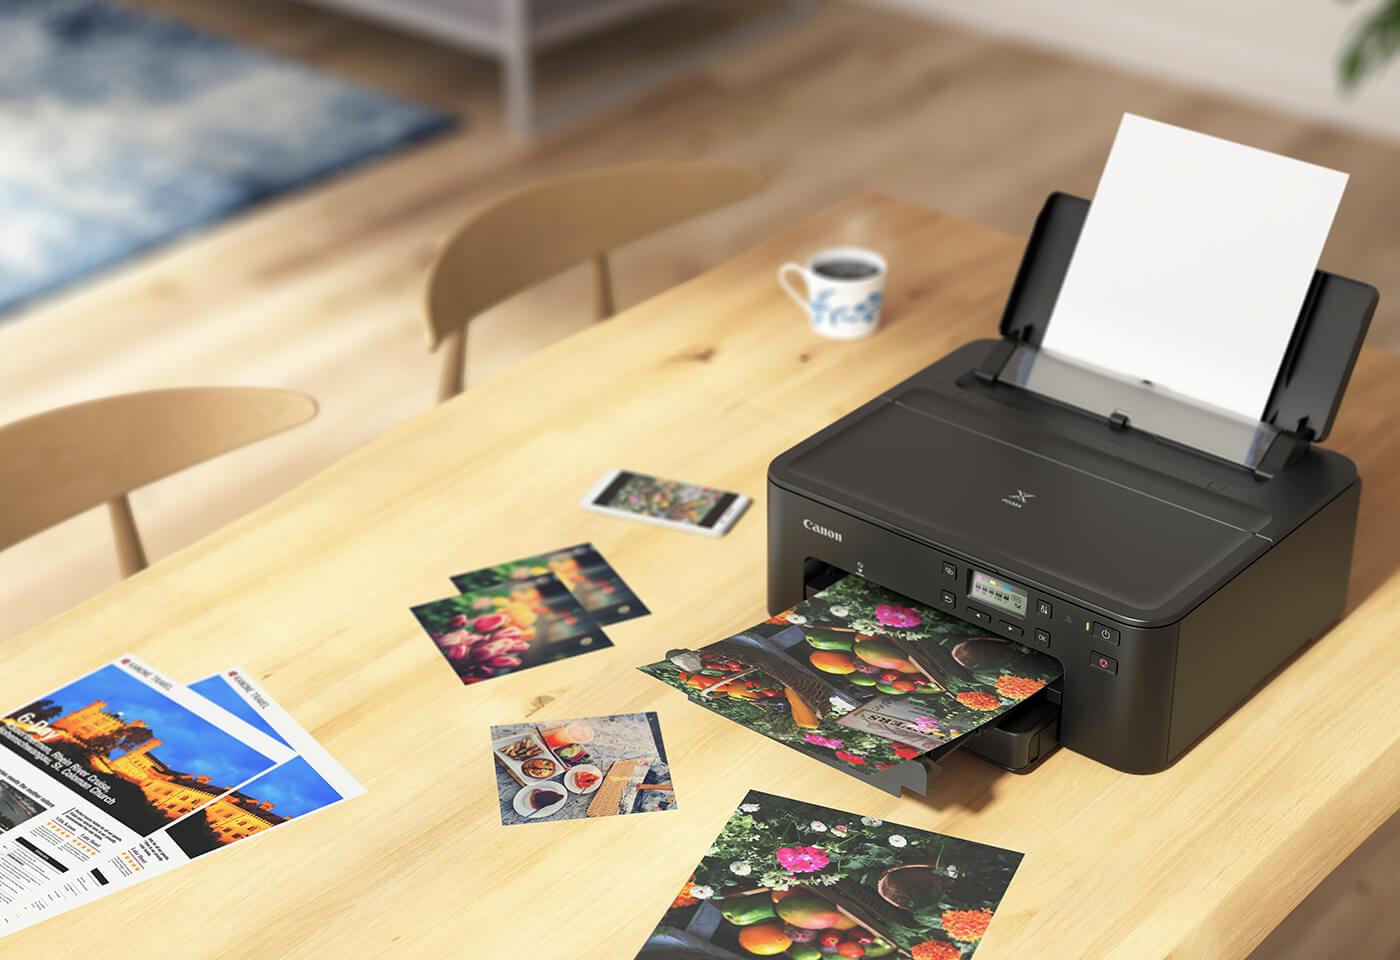 PIXMA TS706 printing vibrant photos on desk